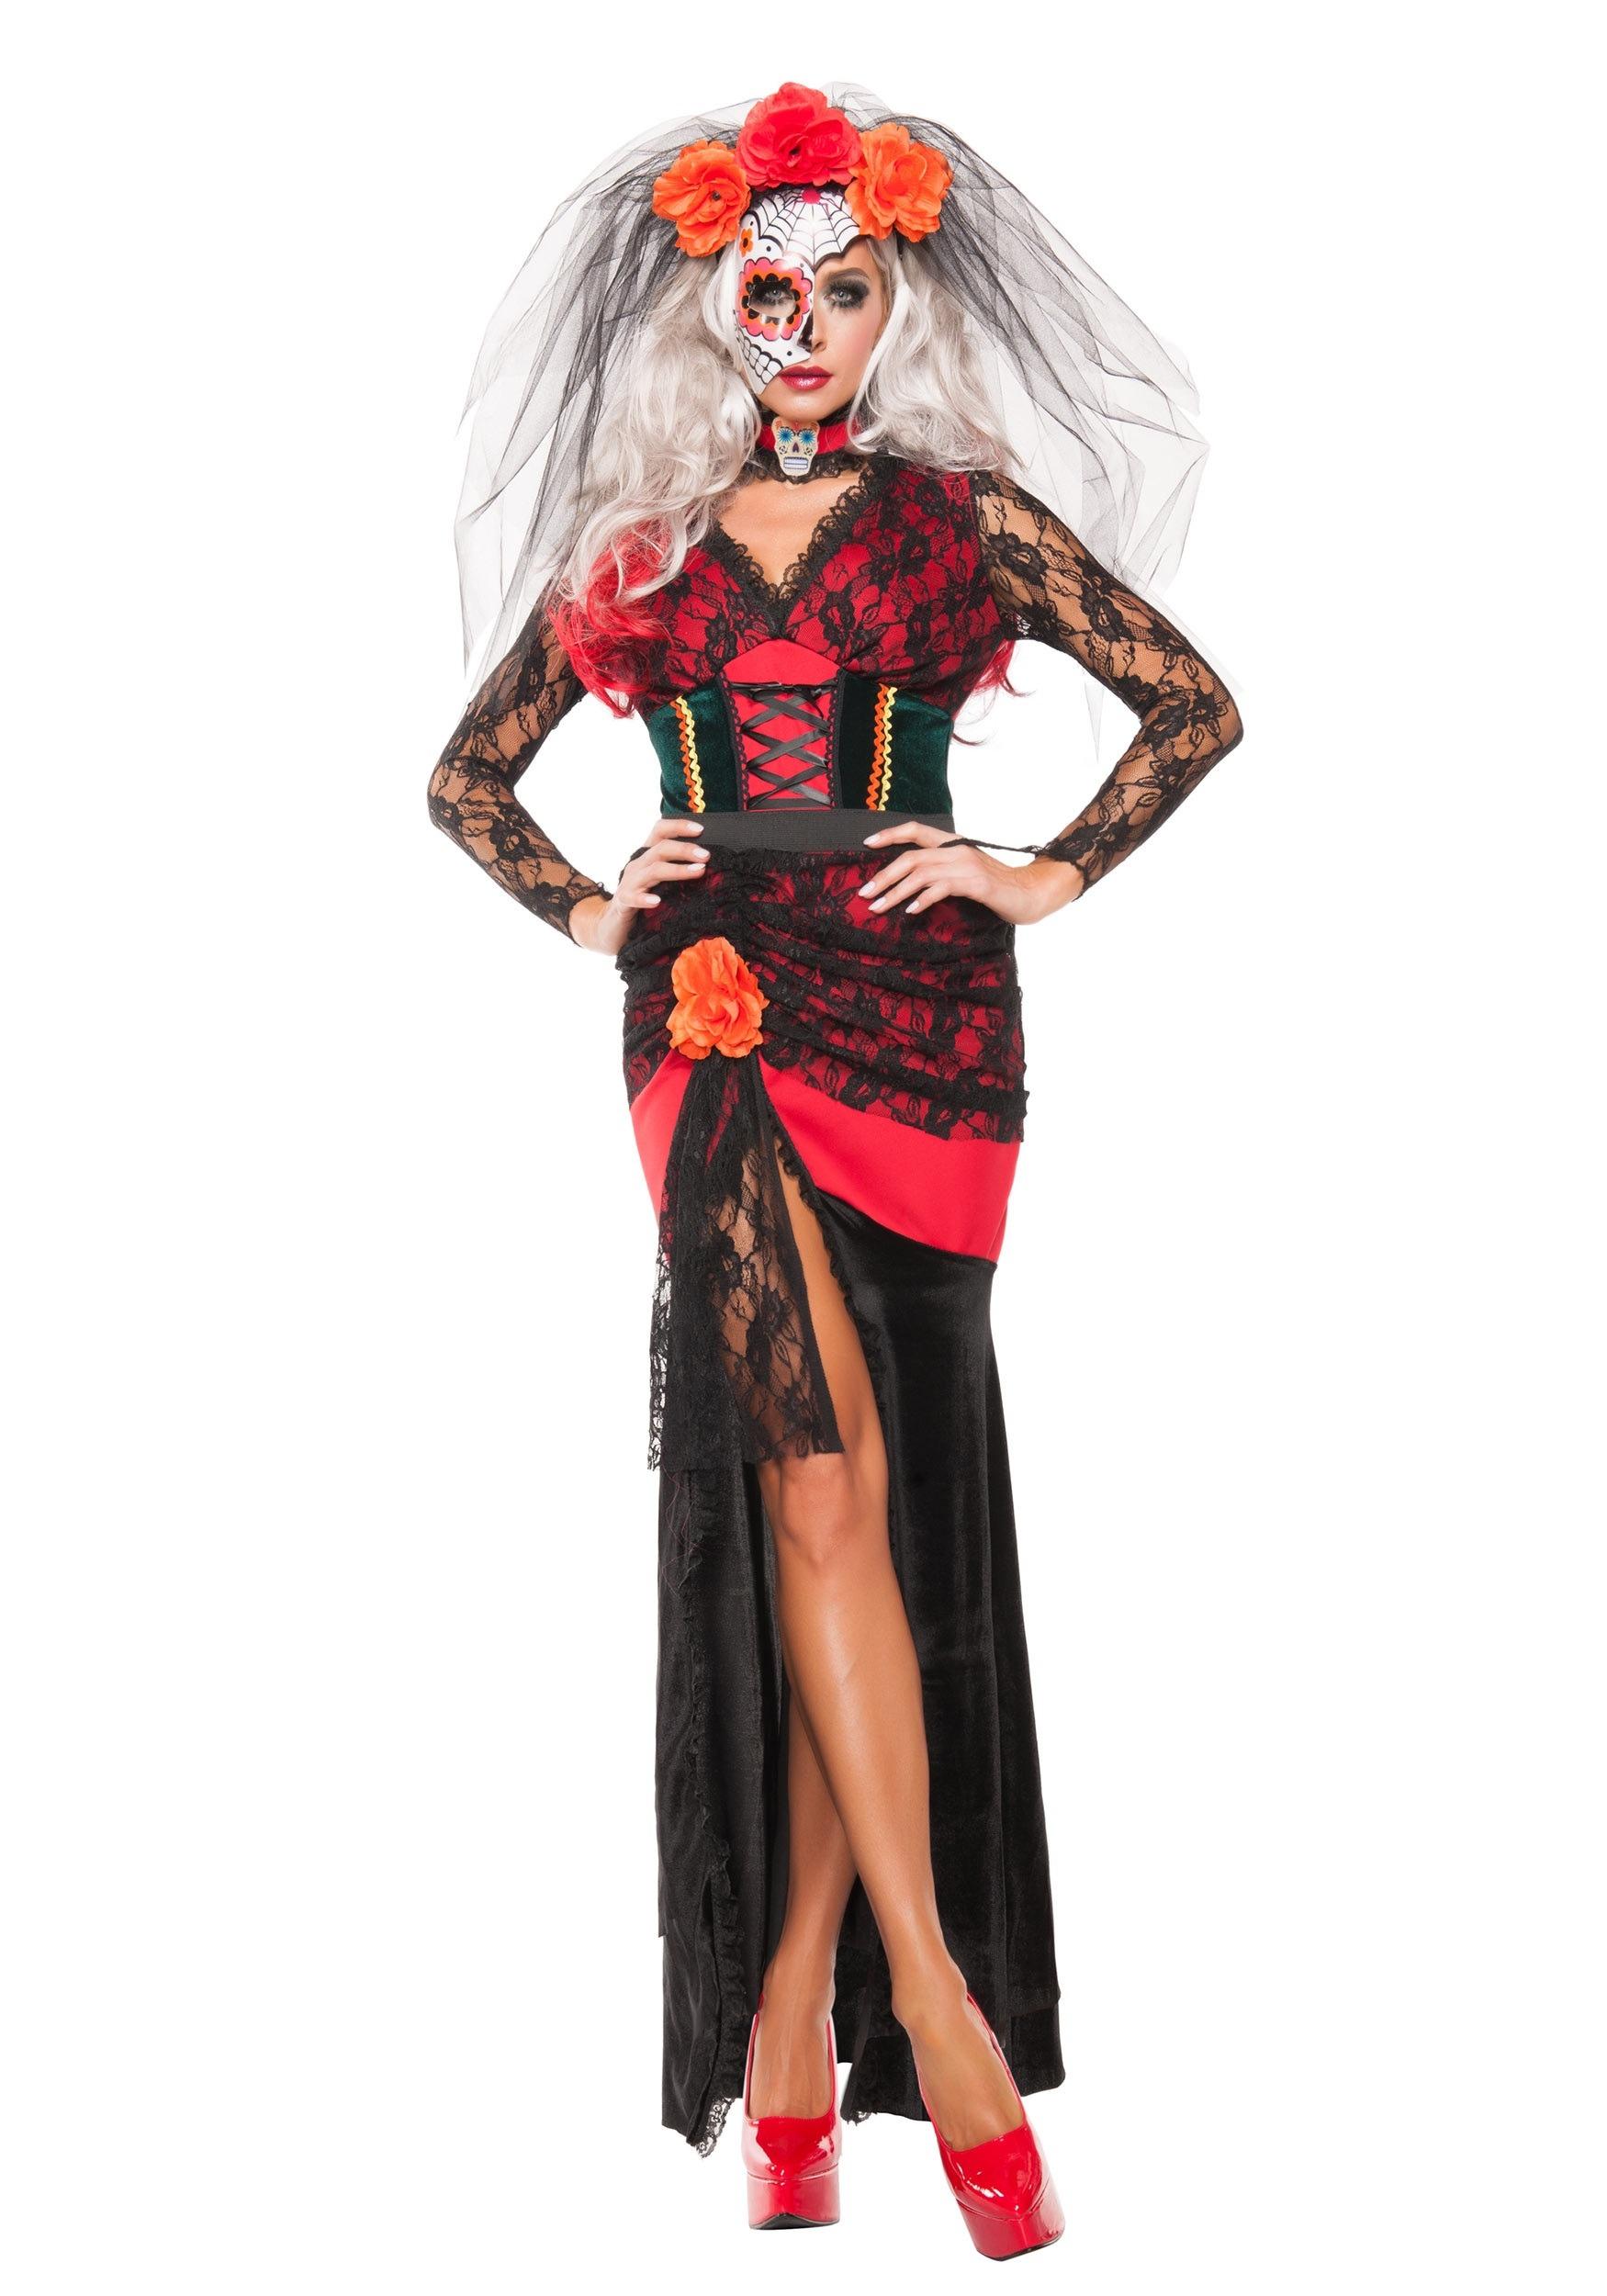 10 Fabulous Day Of The Dead Dress Ideas spanish dresses mariachi matador costumes halloweencostumes 2020